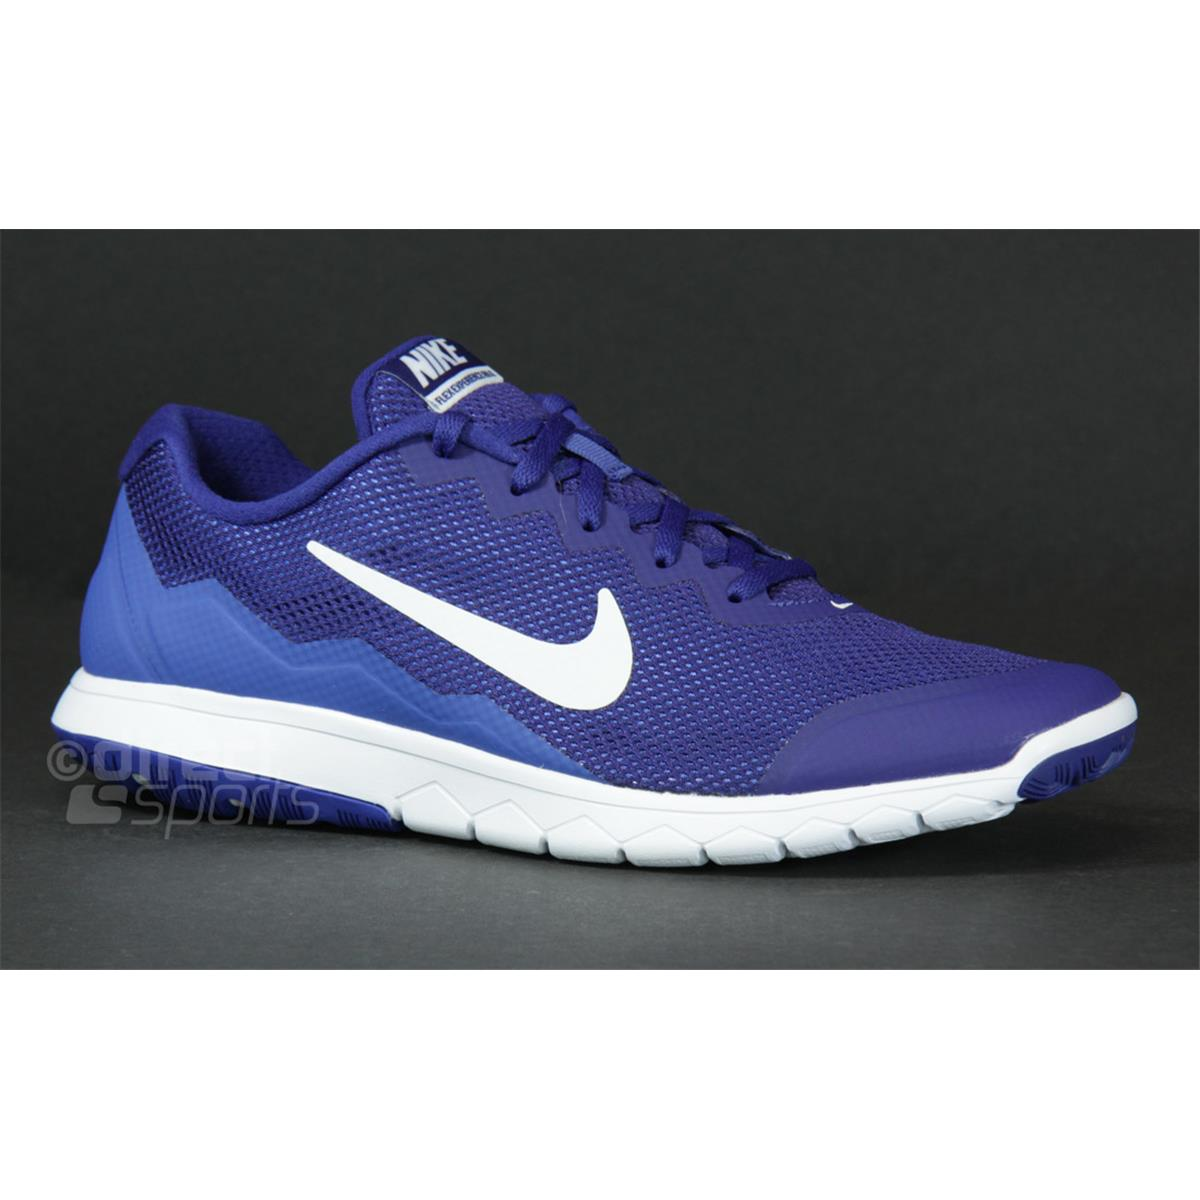 42d82e8a87d Nike Flex Experience RN Mans Running Shoes Black Blue